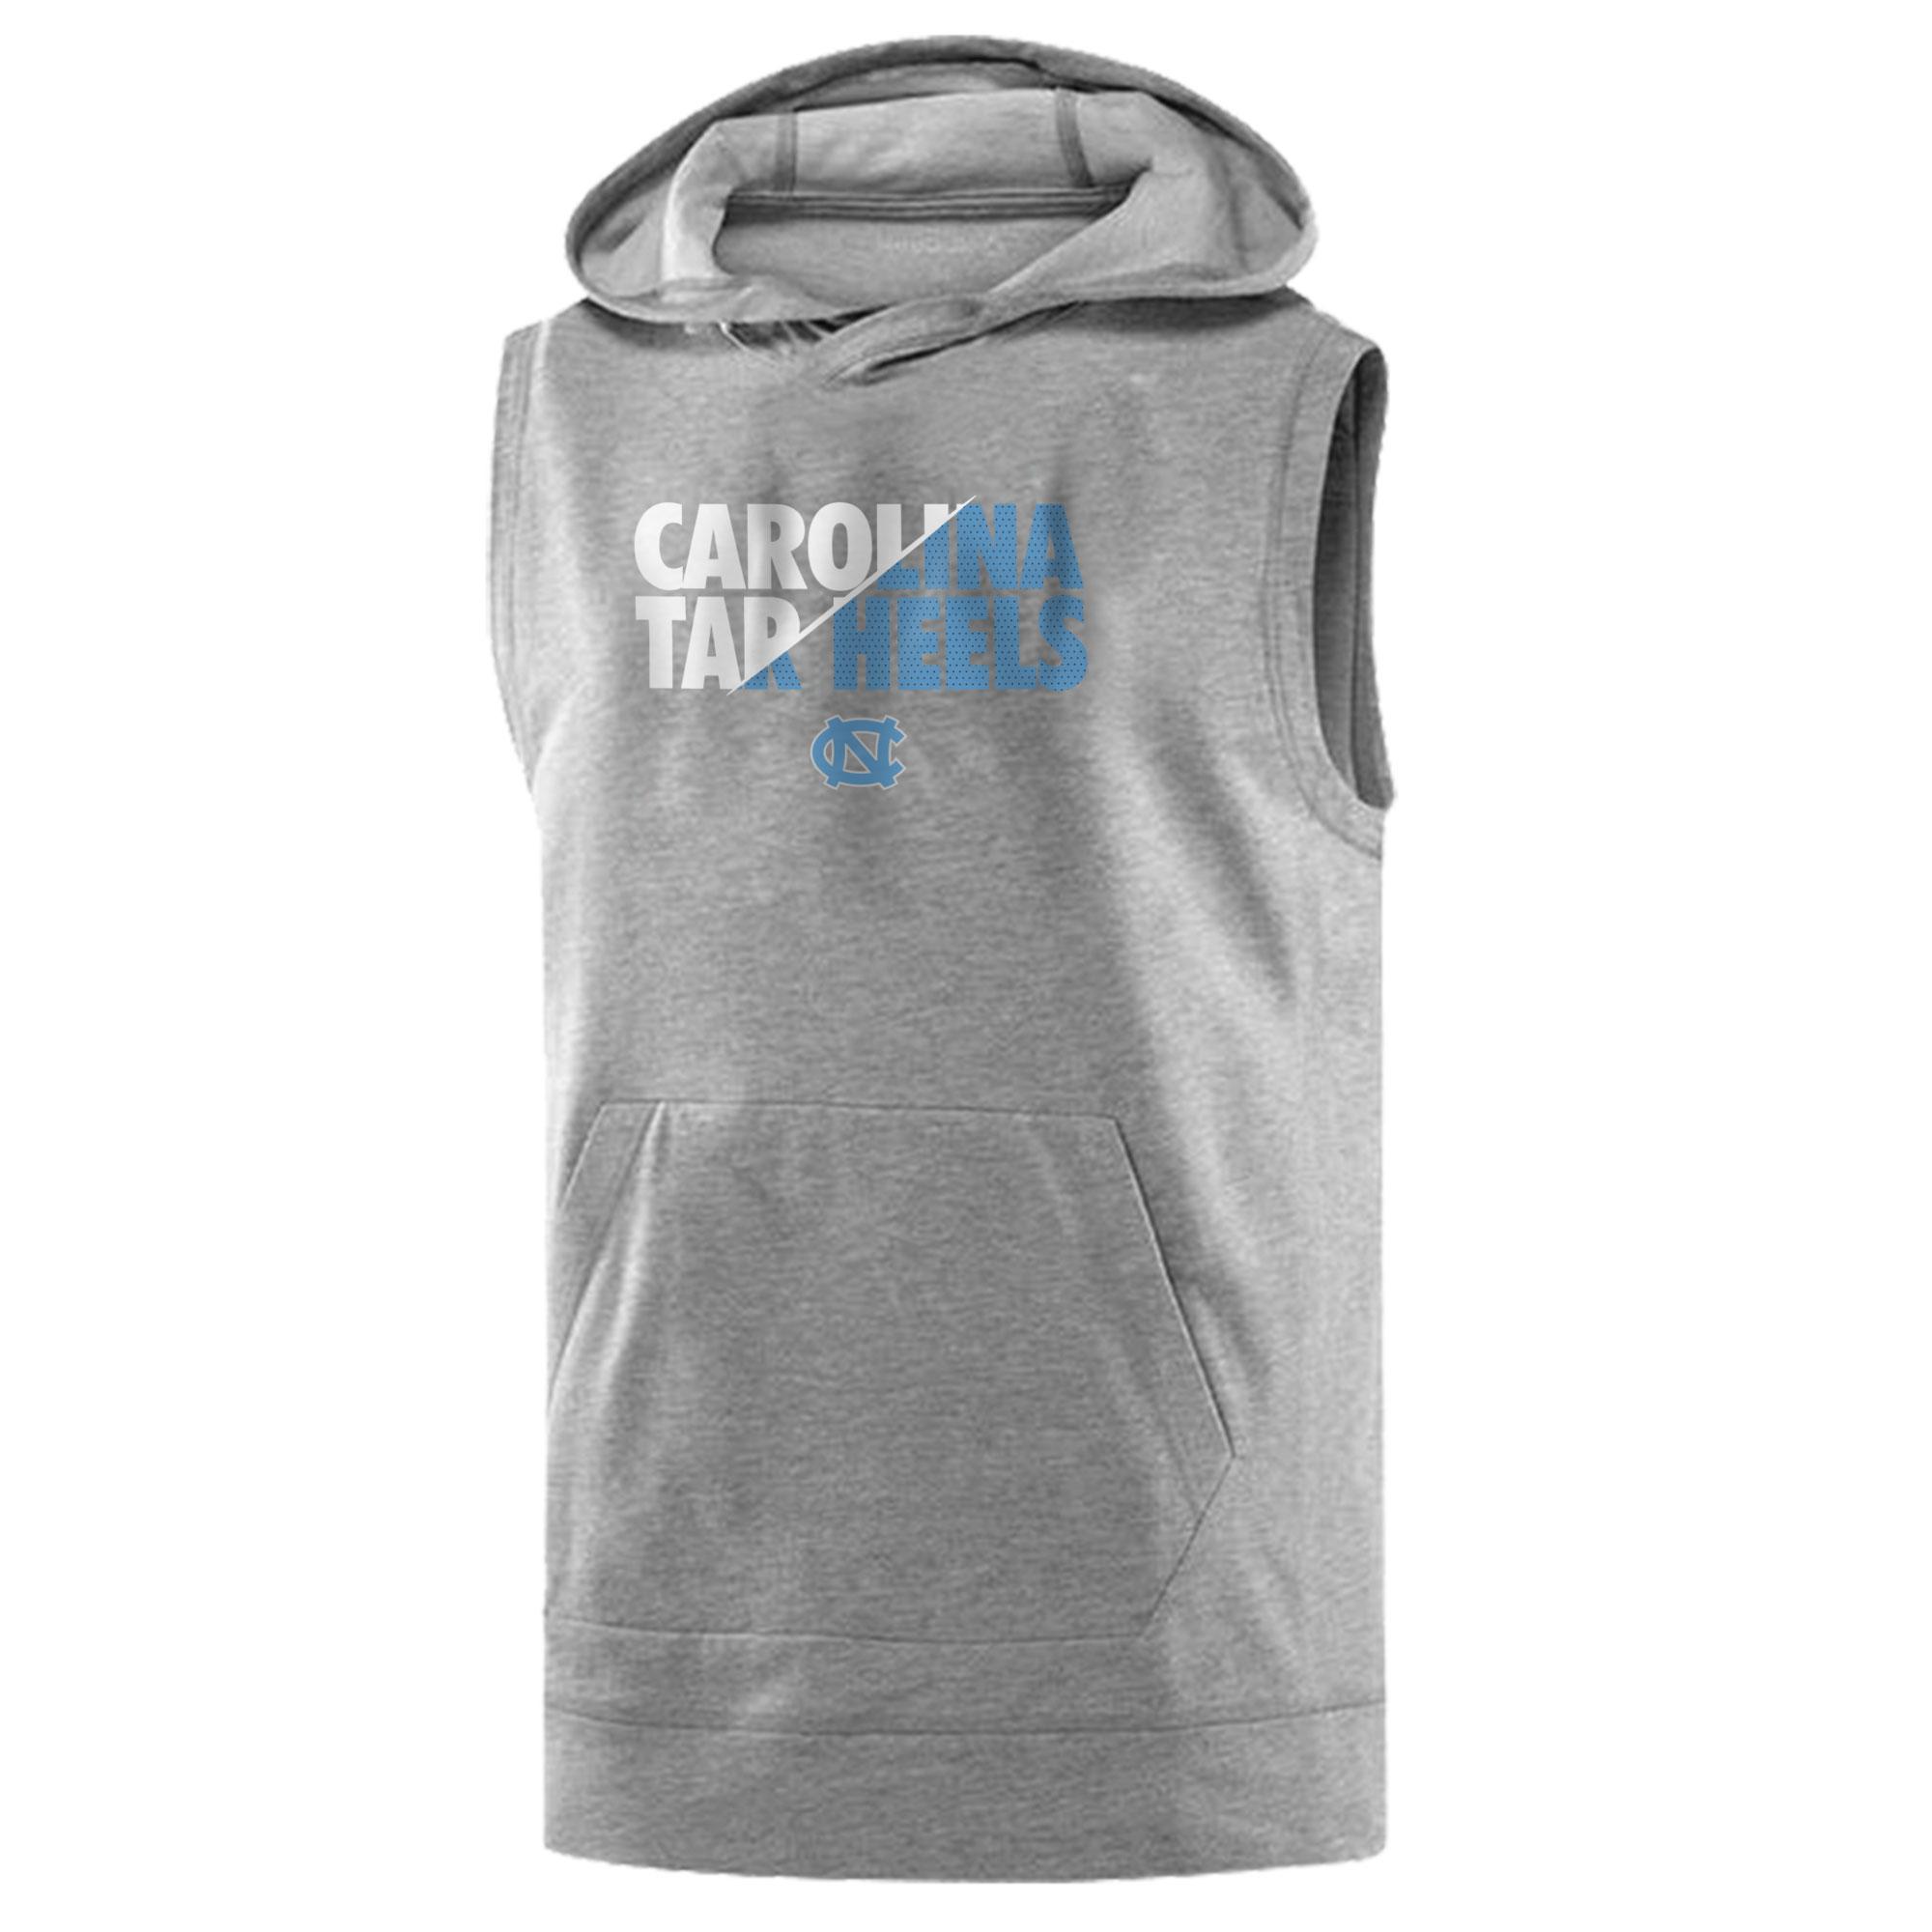 Carolina Tar Heels Sleeveless (KLS-GRY-486-NCAA-CAROLINA-HEELS)